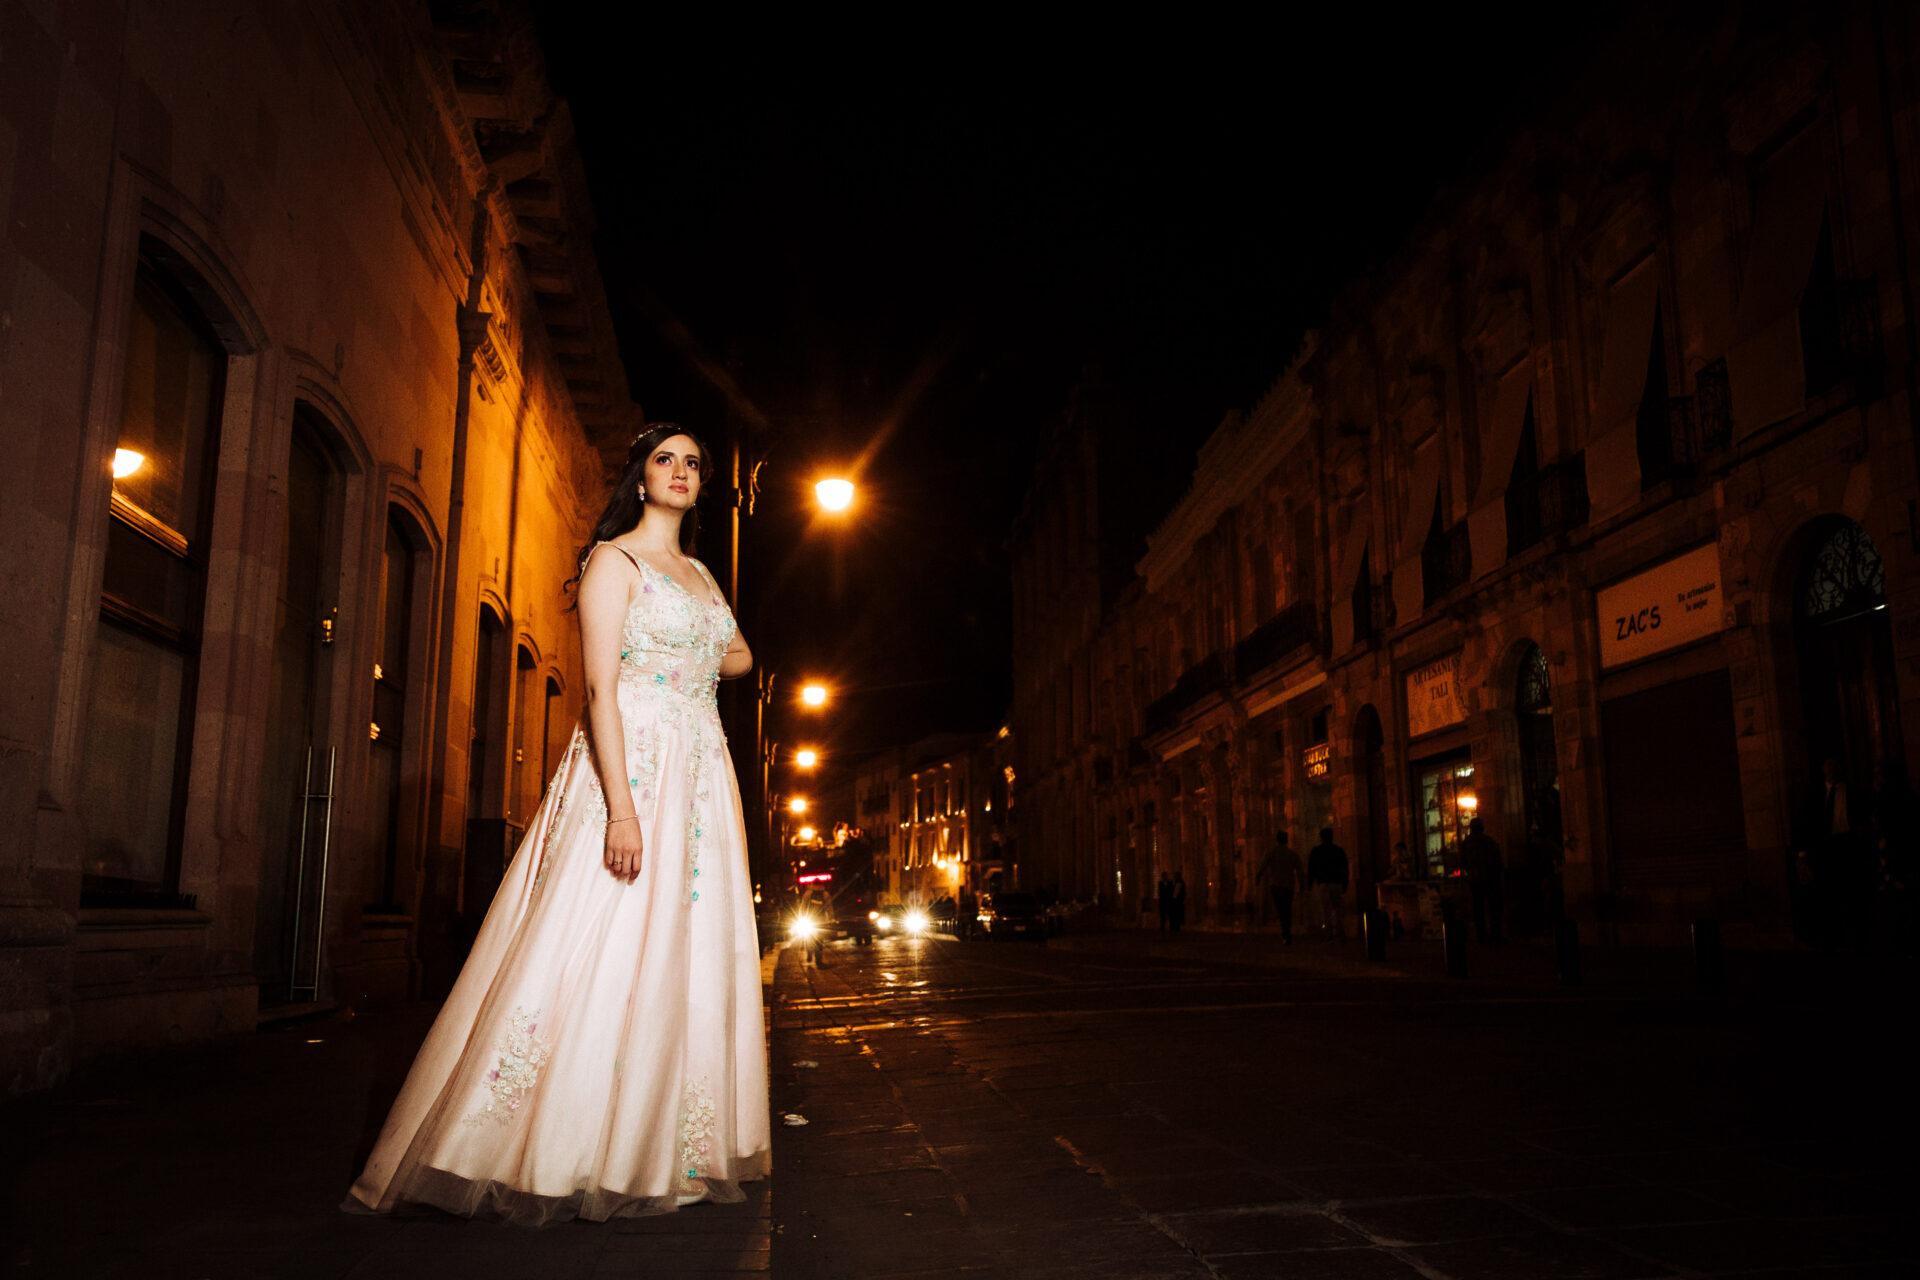 javier_noriega_fotografo_bodas_zacatecas_trash_the_dress_xv_años00012